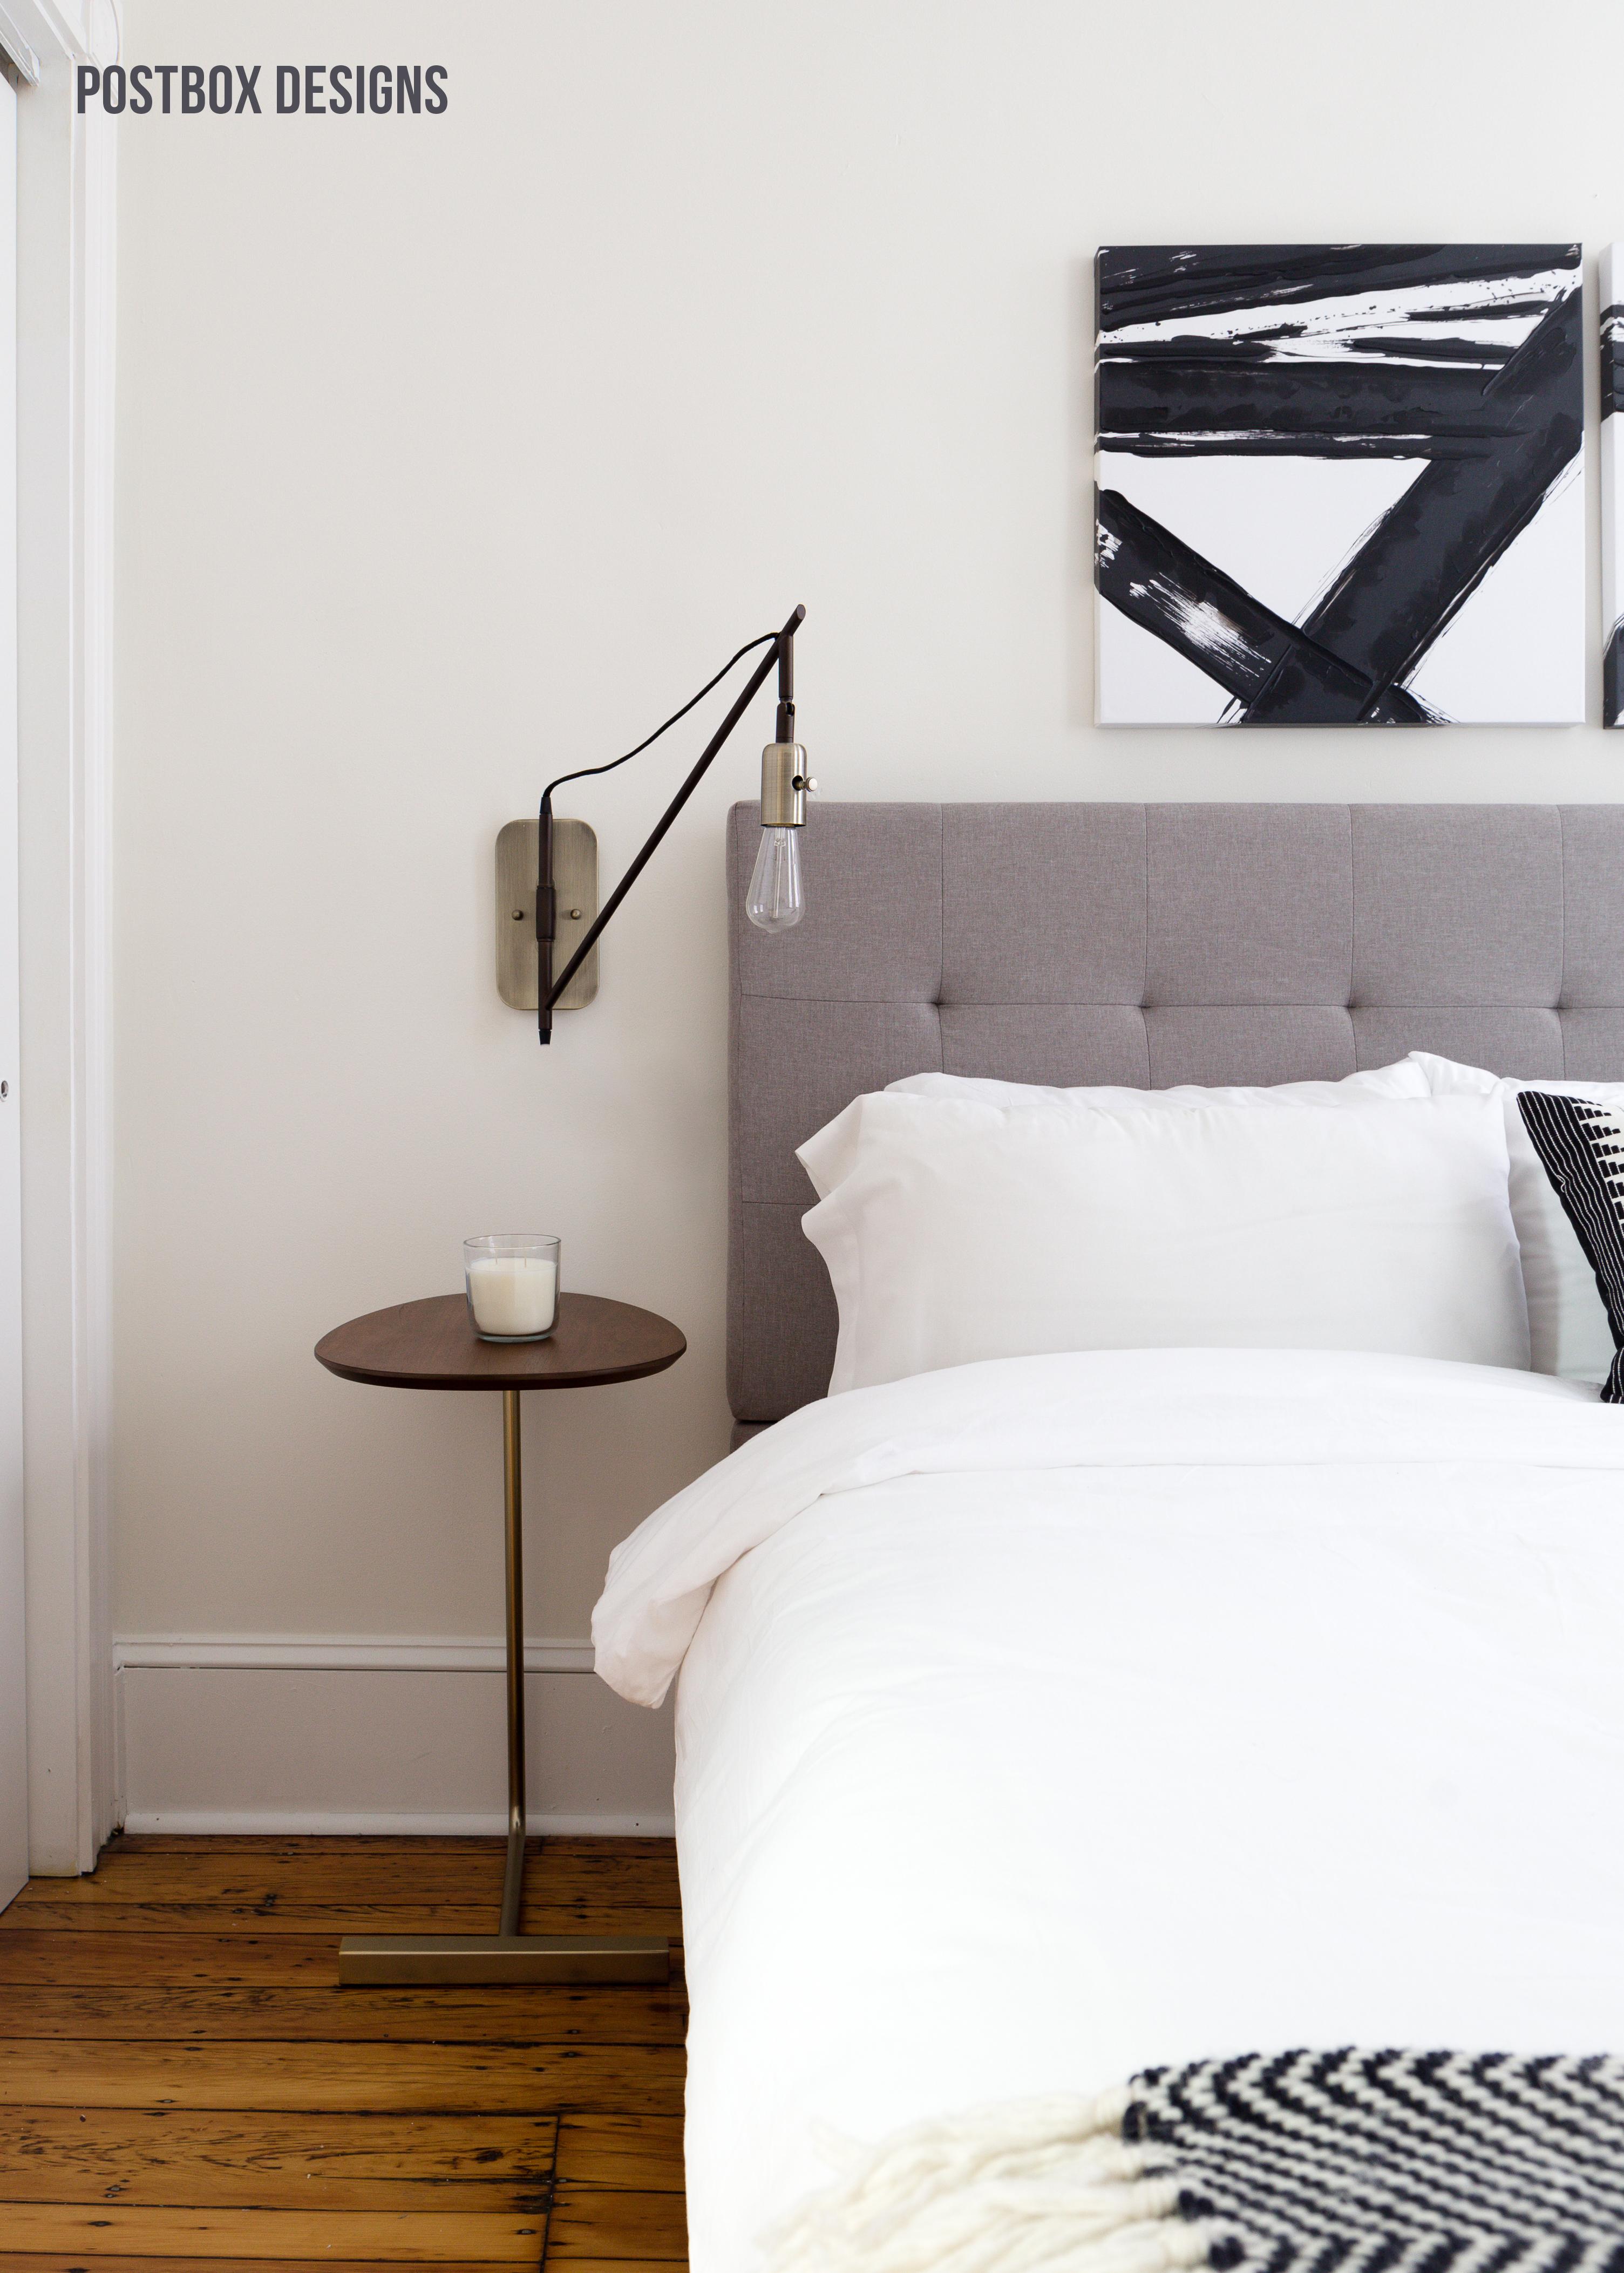 Postbox Designs E-Design: Neutral Modern Boho Bedroom Makeover, Modern Bedroom Decor, Small Space Design